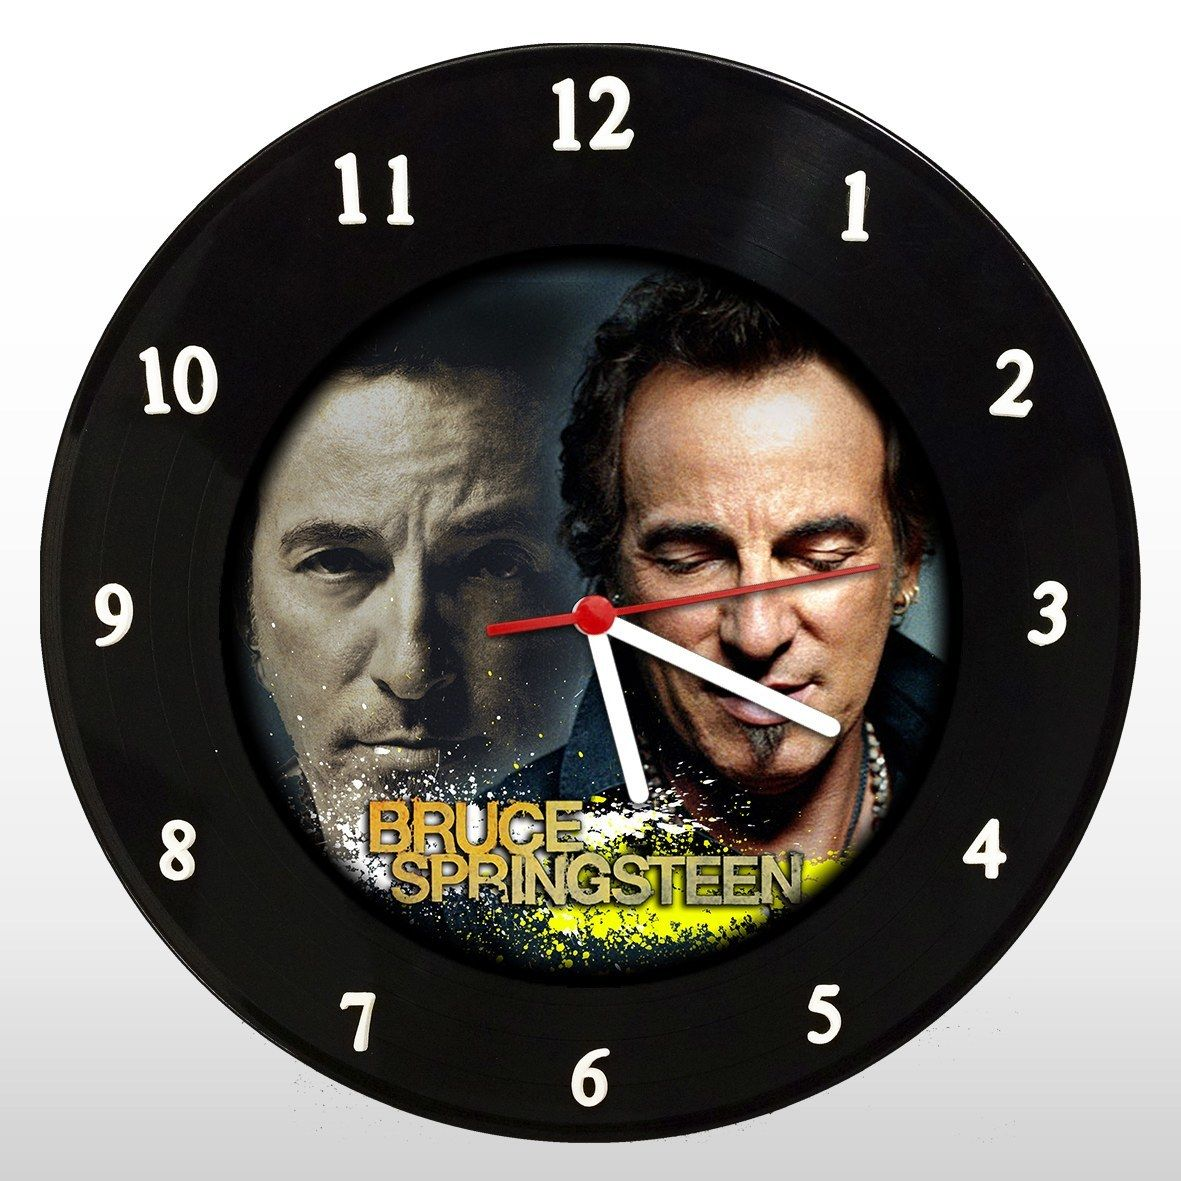 Bruce Springsteen - Relógio de Parede em Disco de Vinil - Mr. Rock